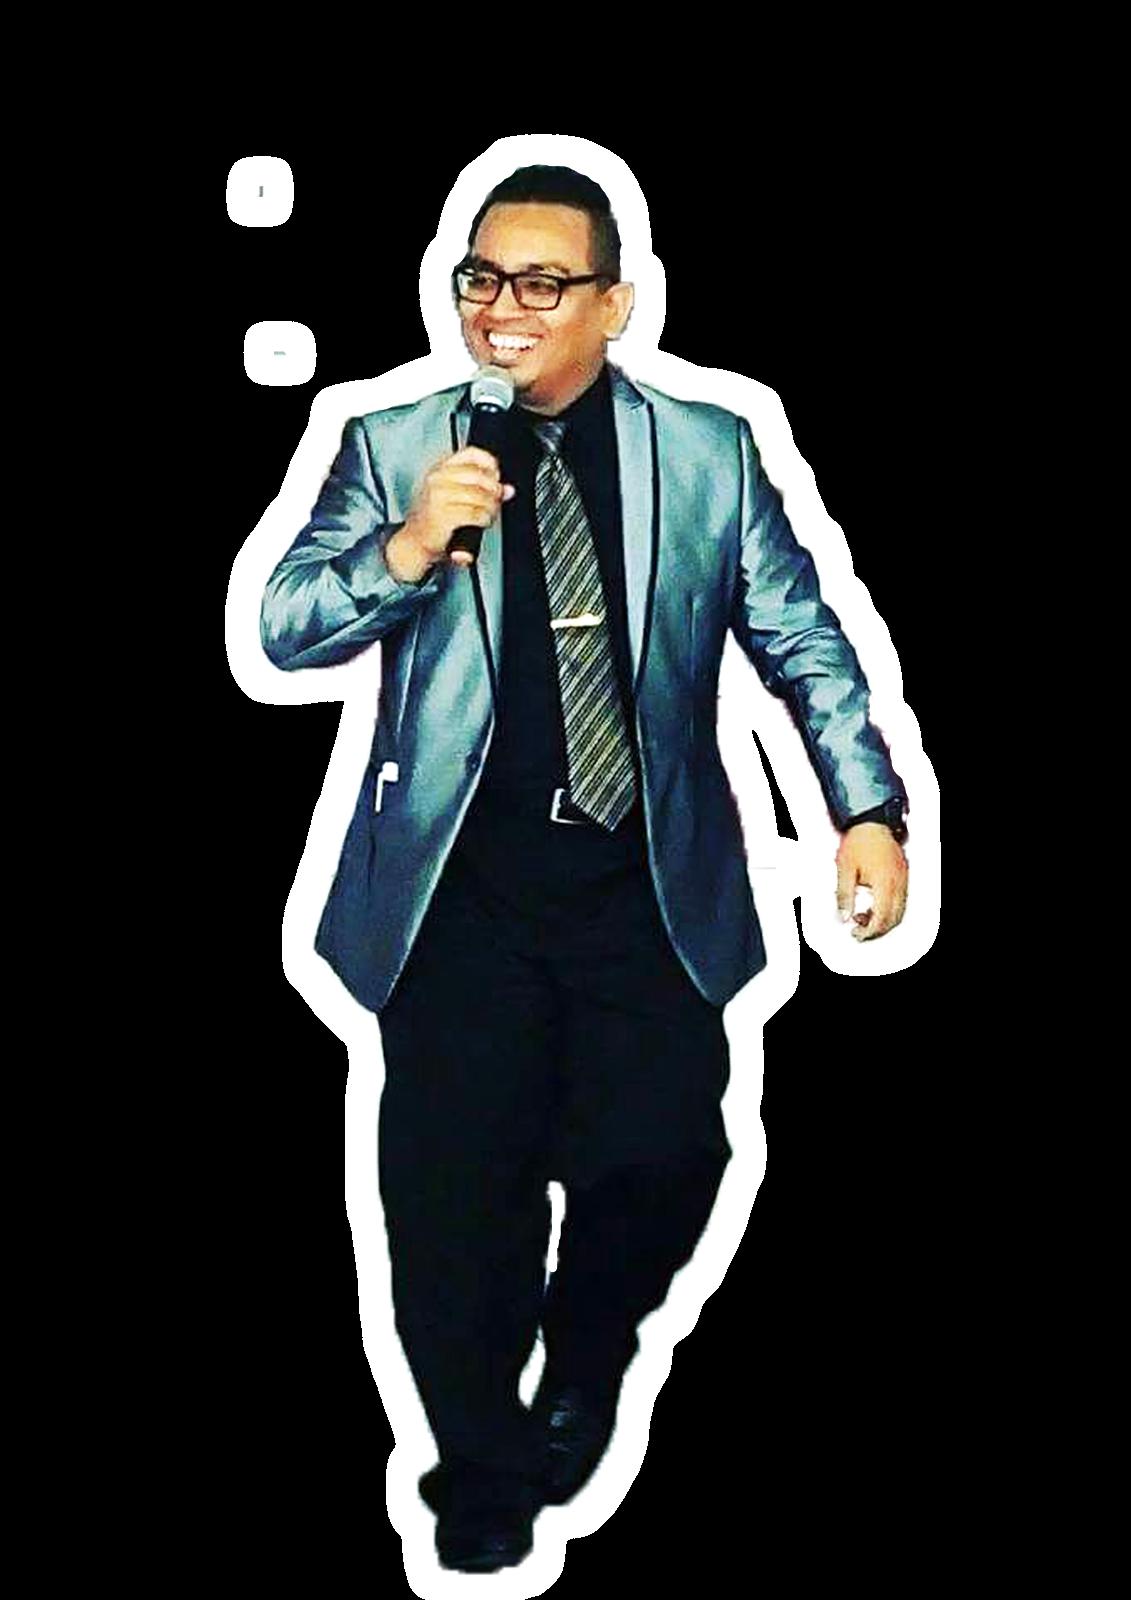 PENGARAH URUSAN J.M.G